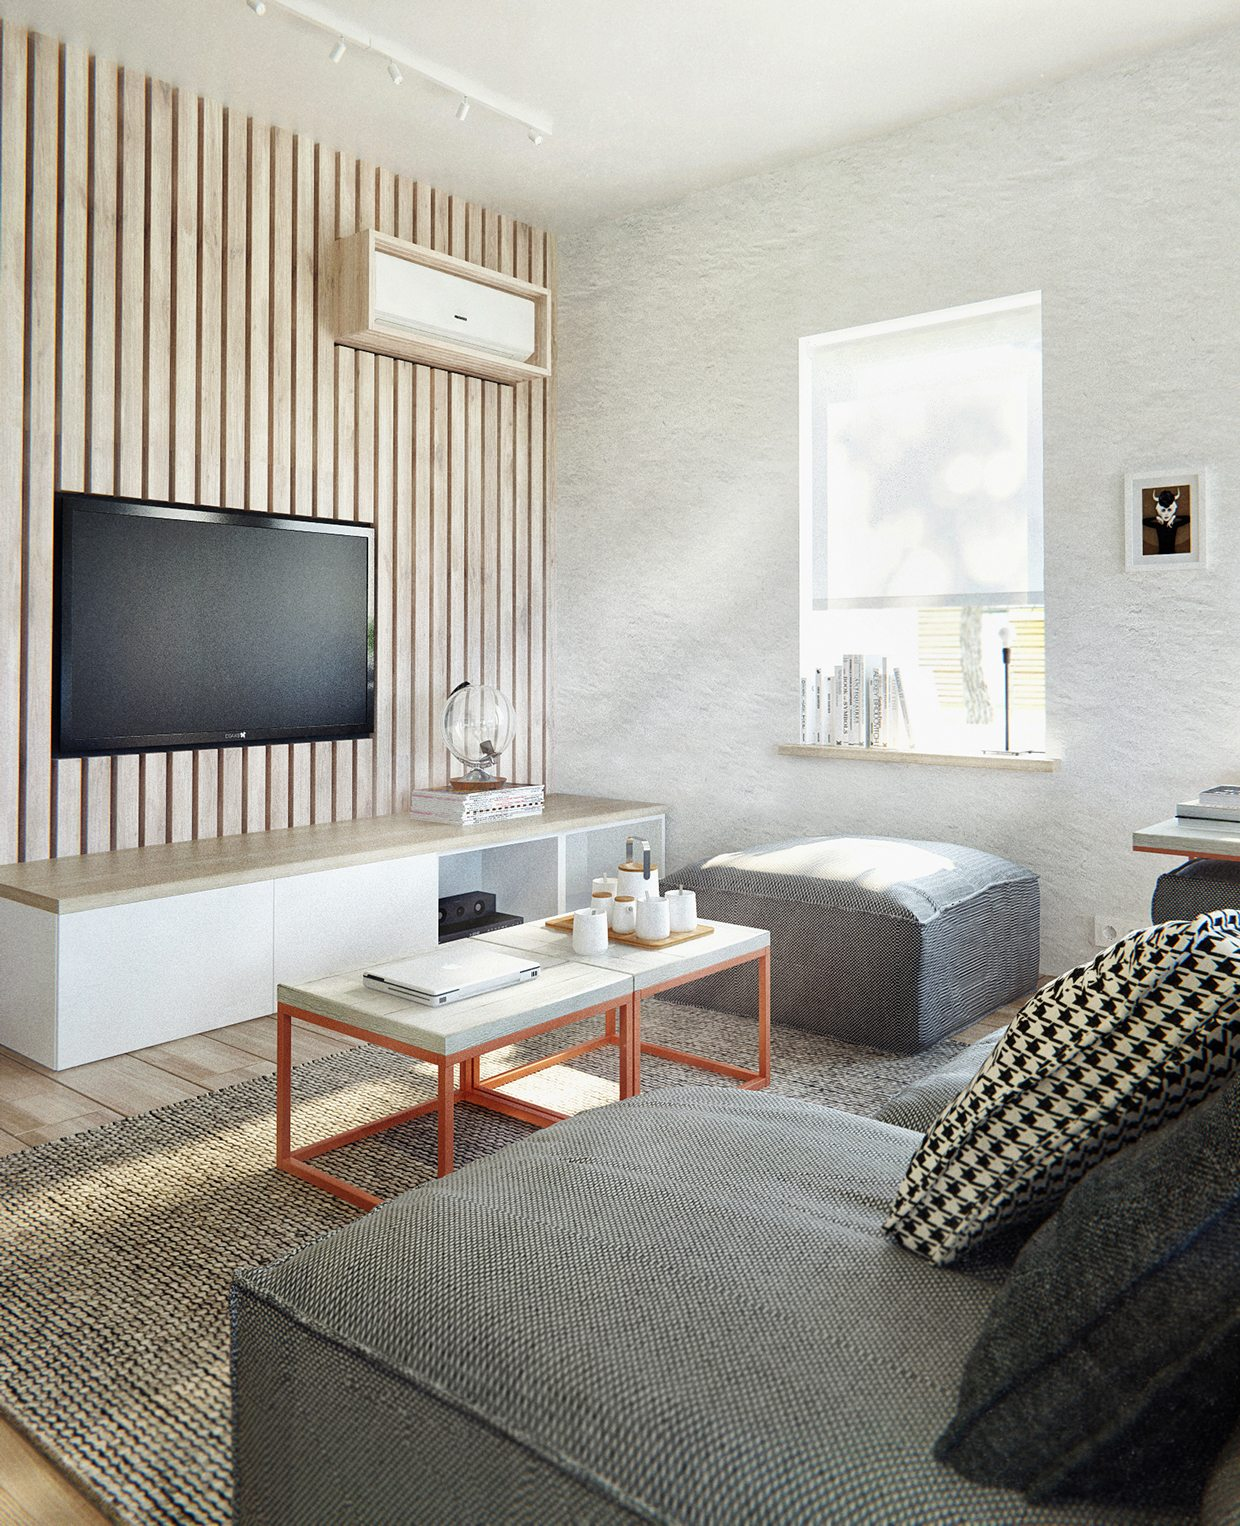 Duplex Penthouse With Scandinavian Aesthetics Amp Industrial